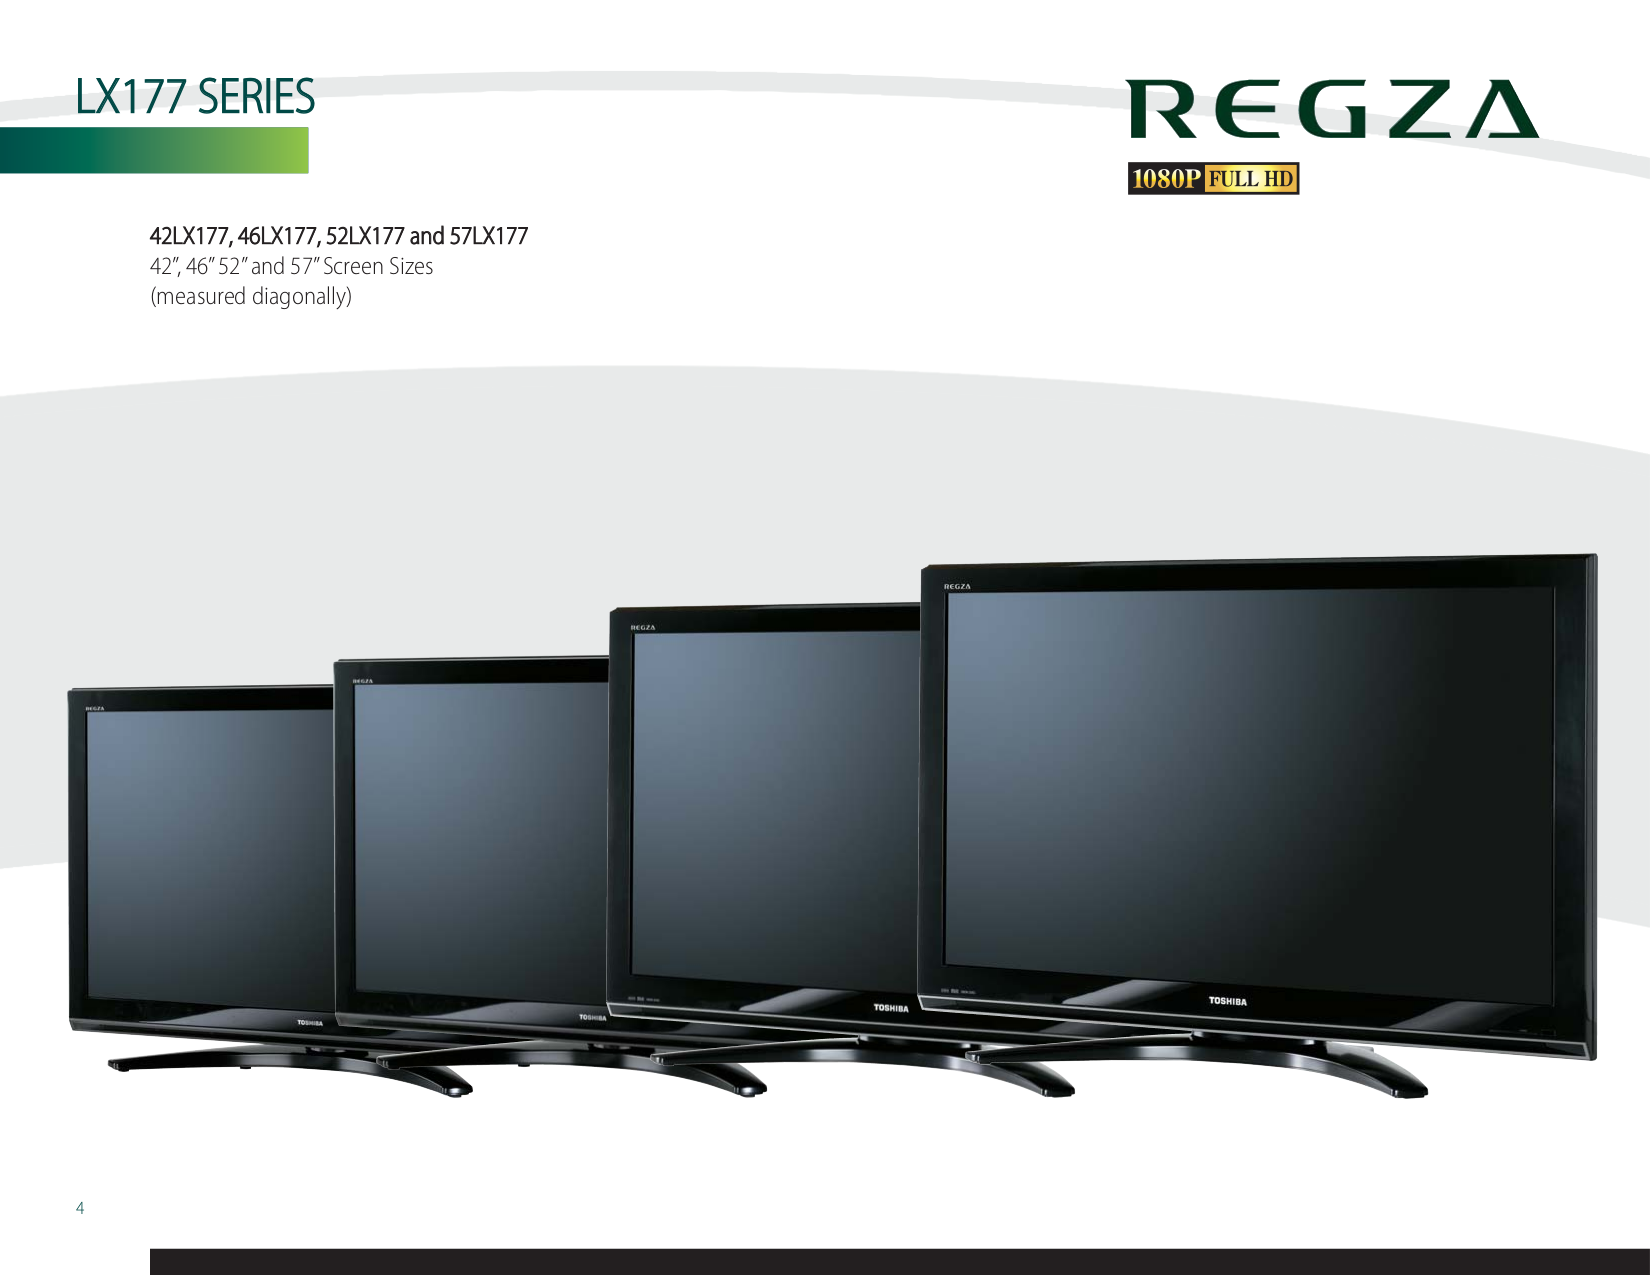 pdf manual for toshiba tv regza 42lx177 rh umlib com Toshiba Flat Screen TV Manual Toshiba Cinema Series Manual